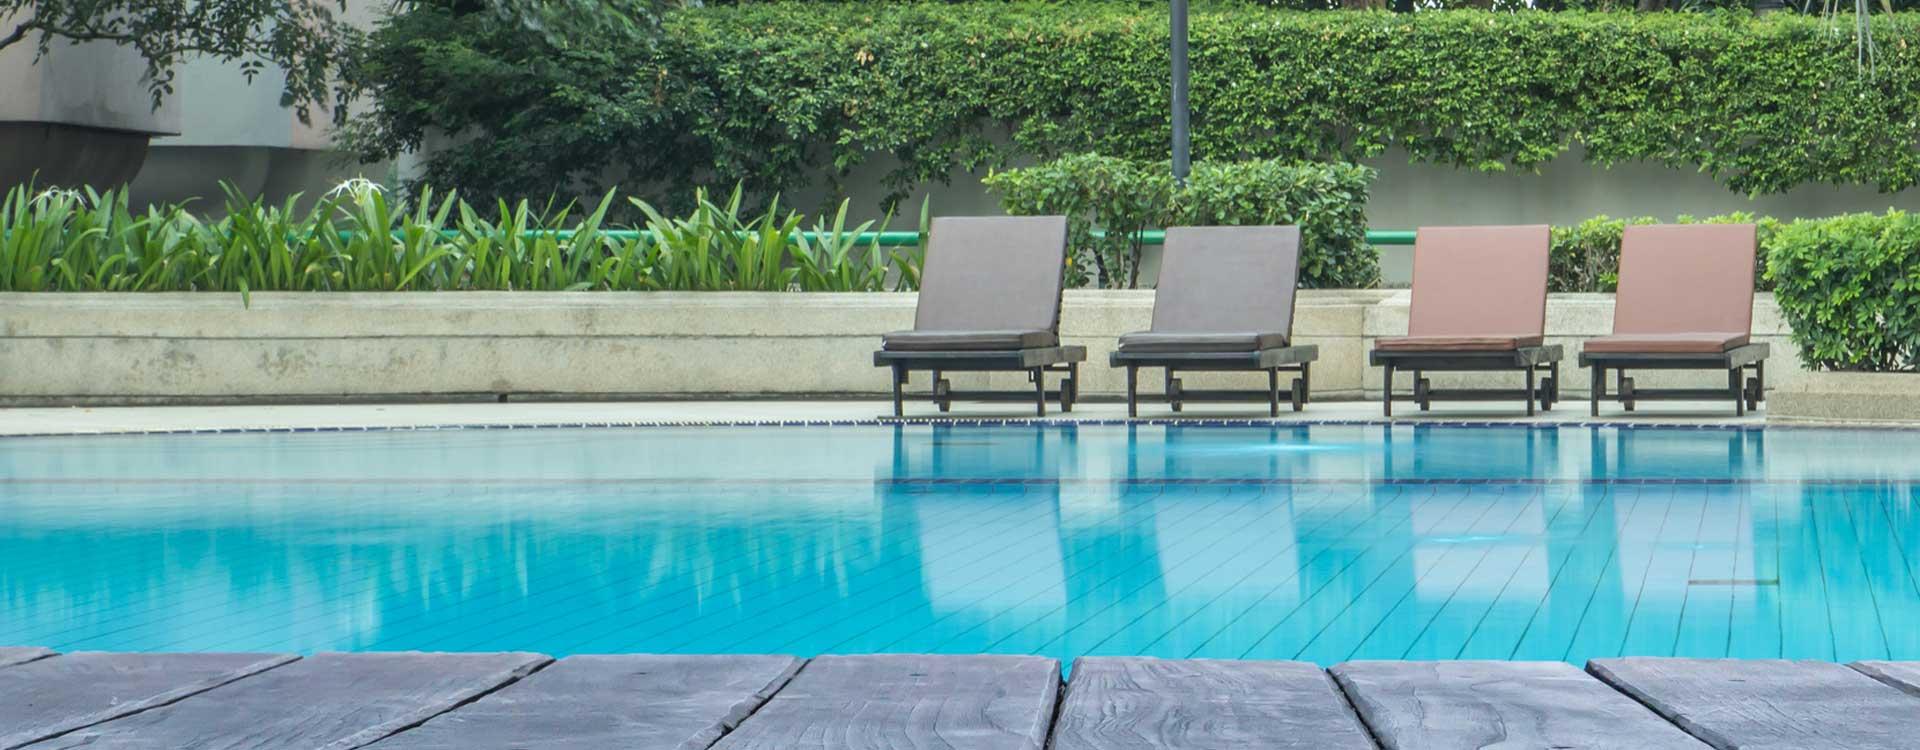 Construire piscine coque polyester